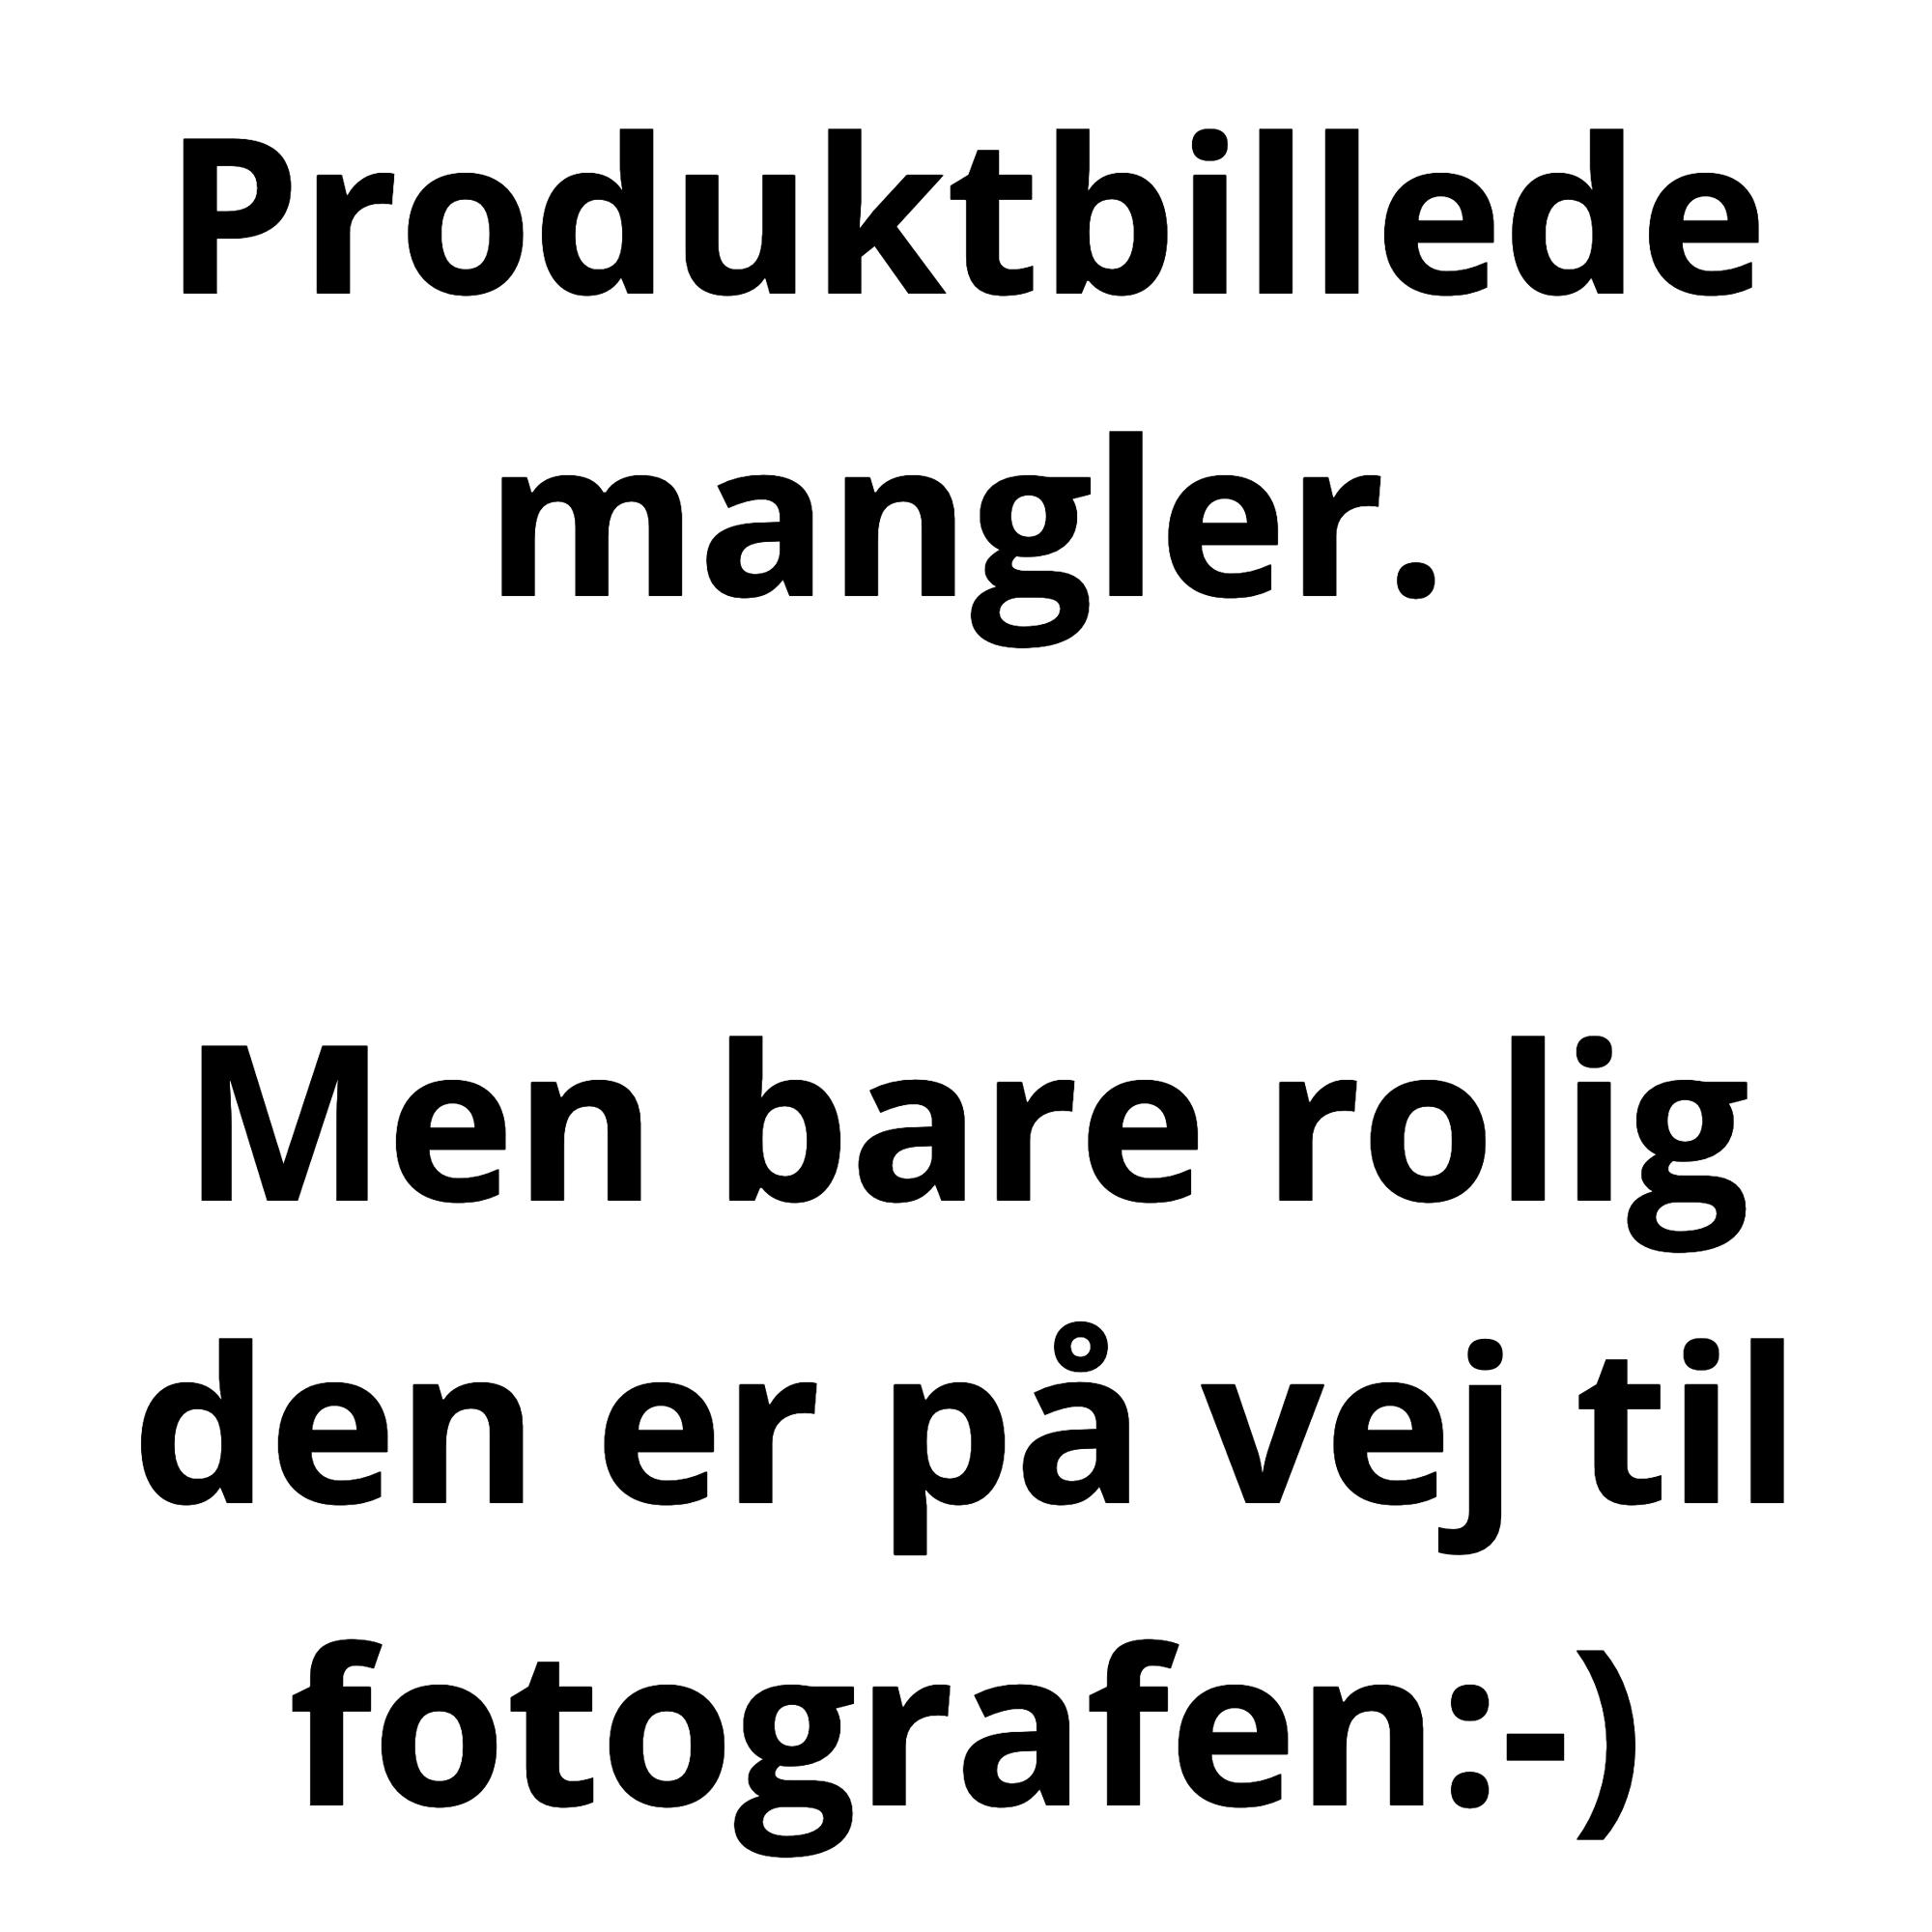 Parrot Mki9000 Bluetooth carkit - Dansk sprog